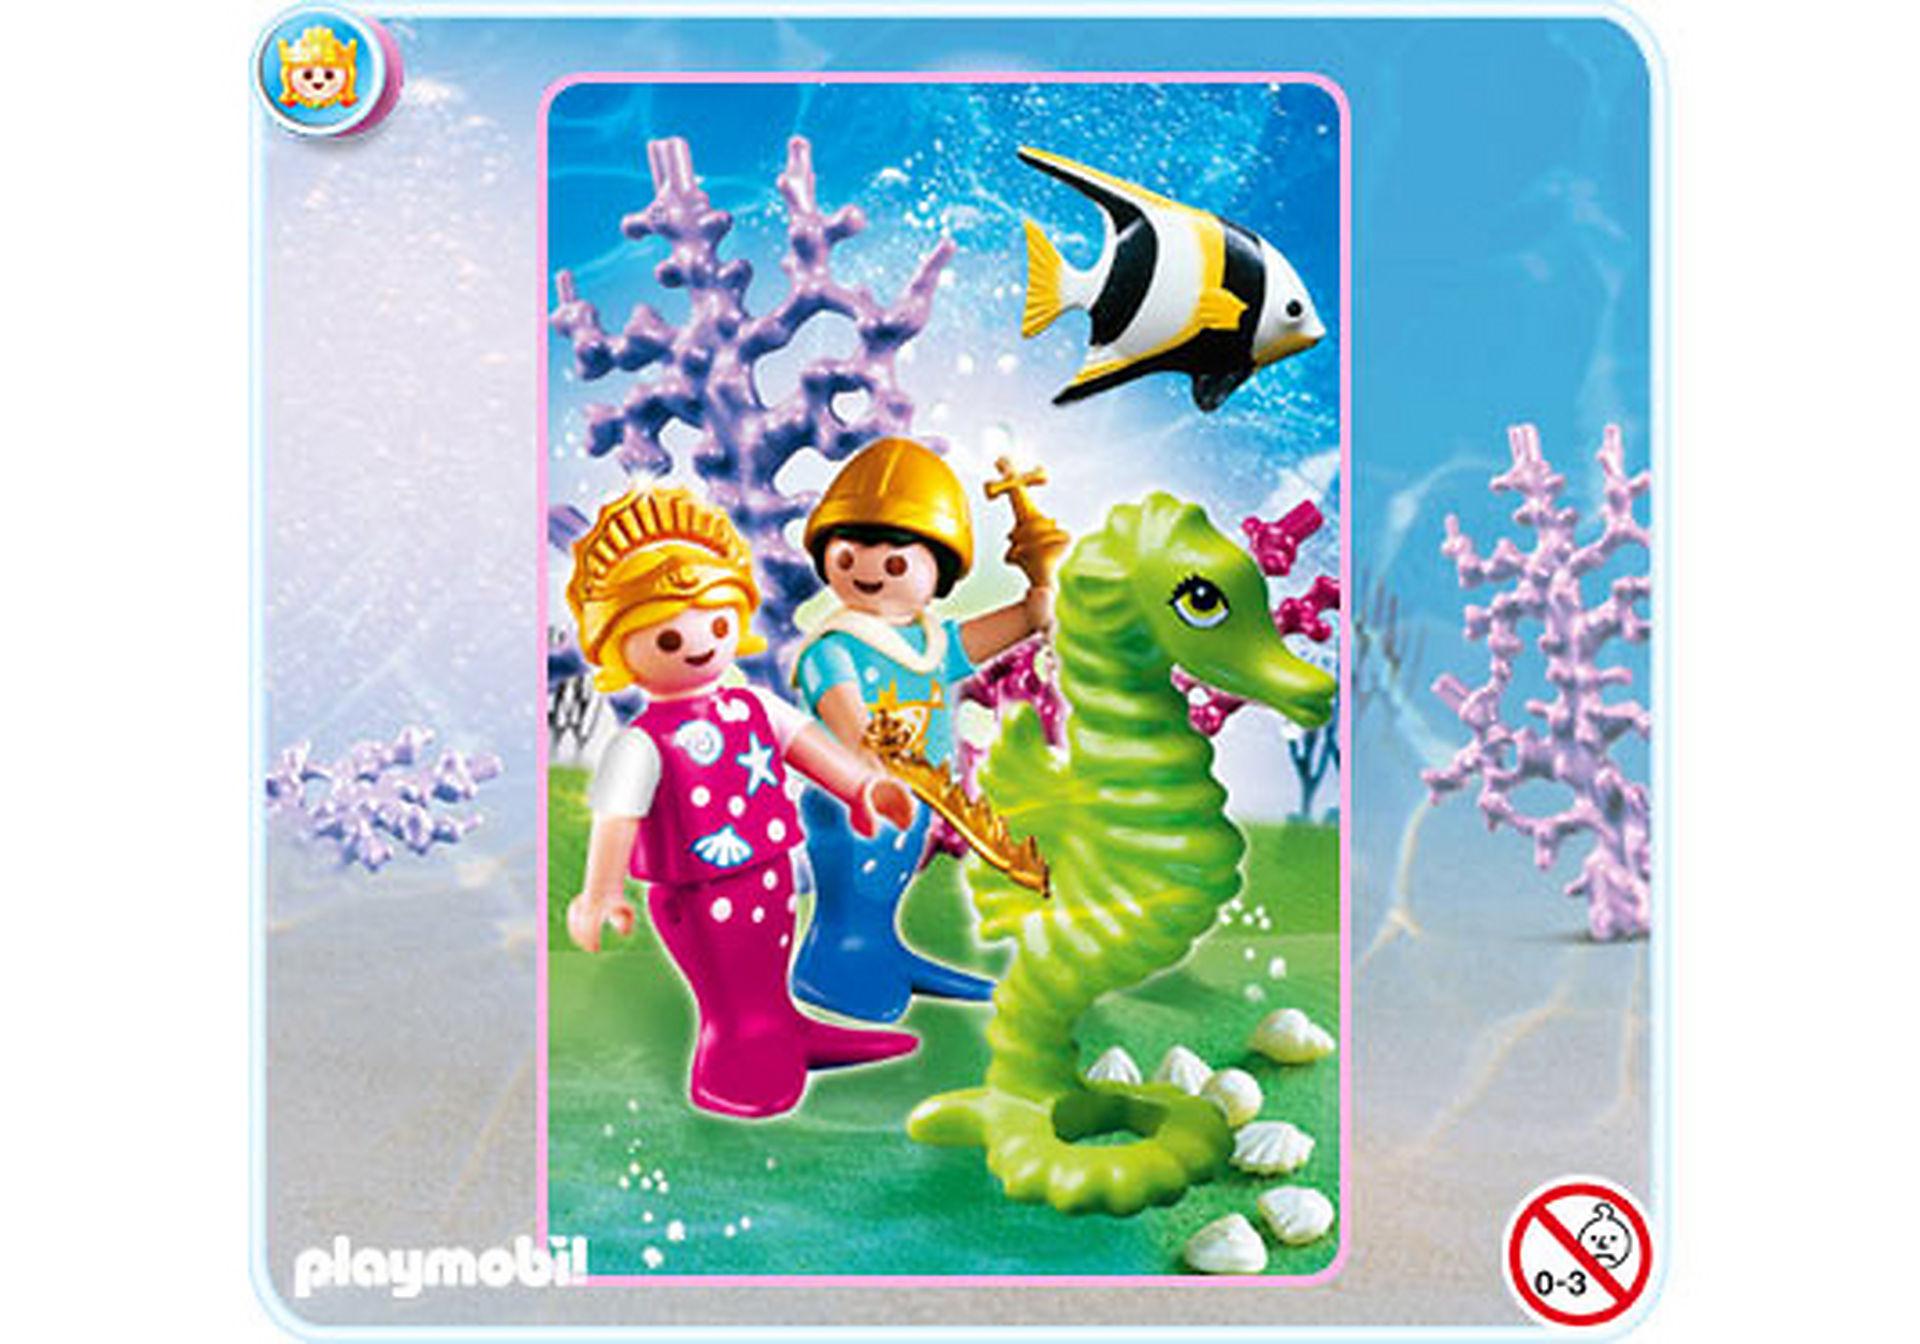 4814-A Petite sirène avec prince zoom image1